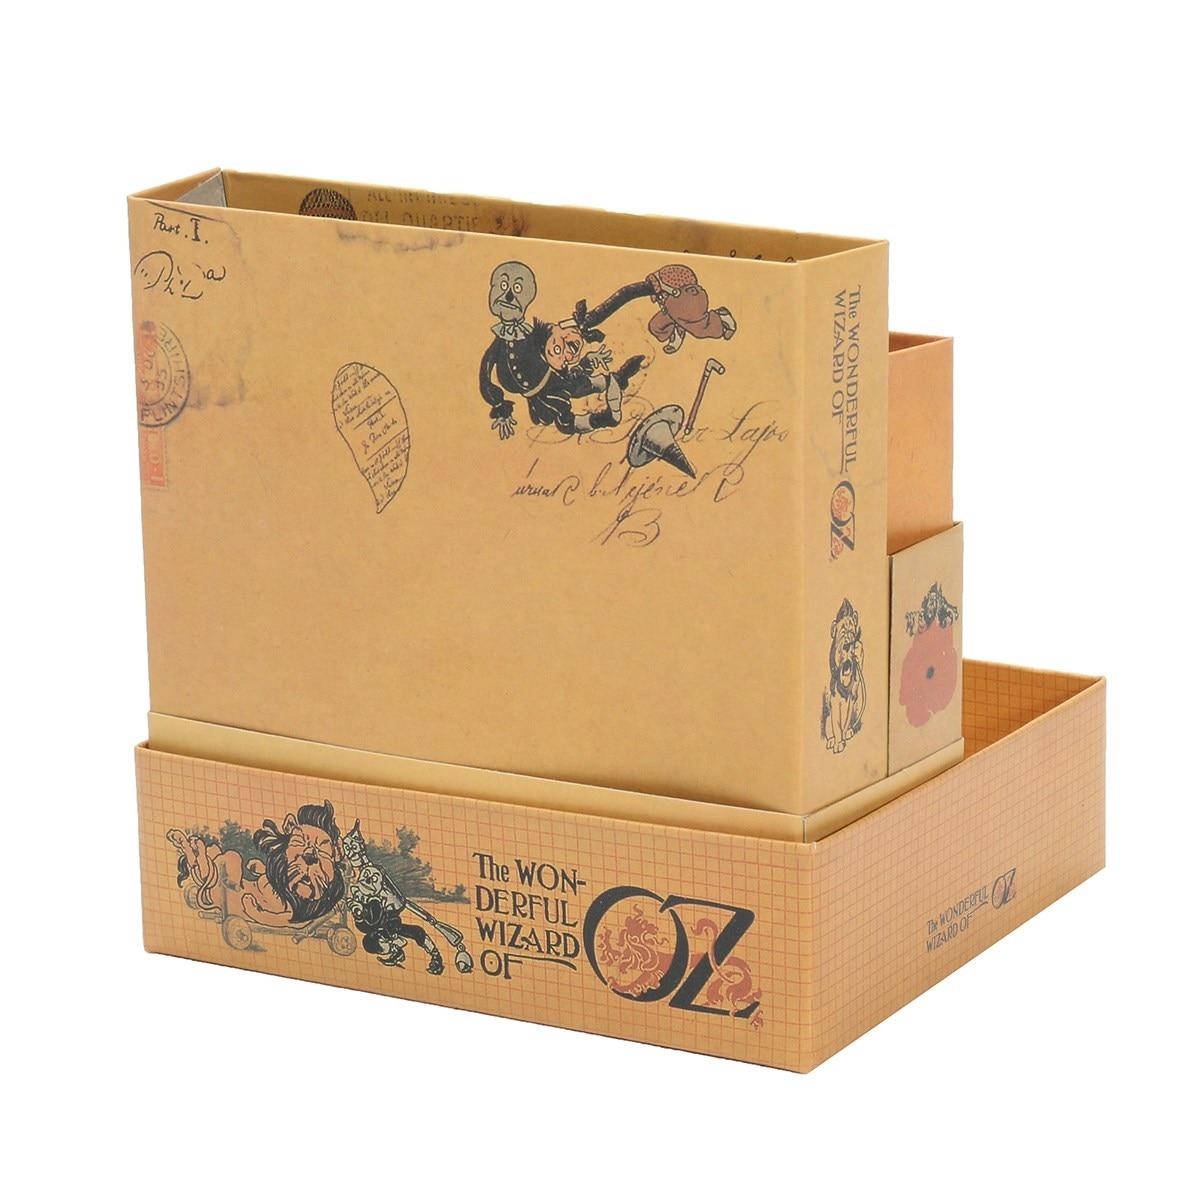 Diy Desktop Box The Wizard Of Oz Storage Organizer Box Vintage Stationery Home Decor Fairytale Illustration